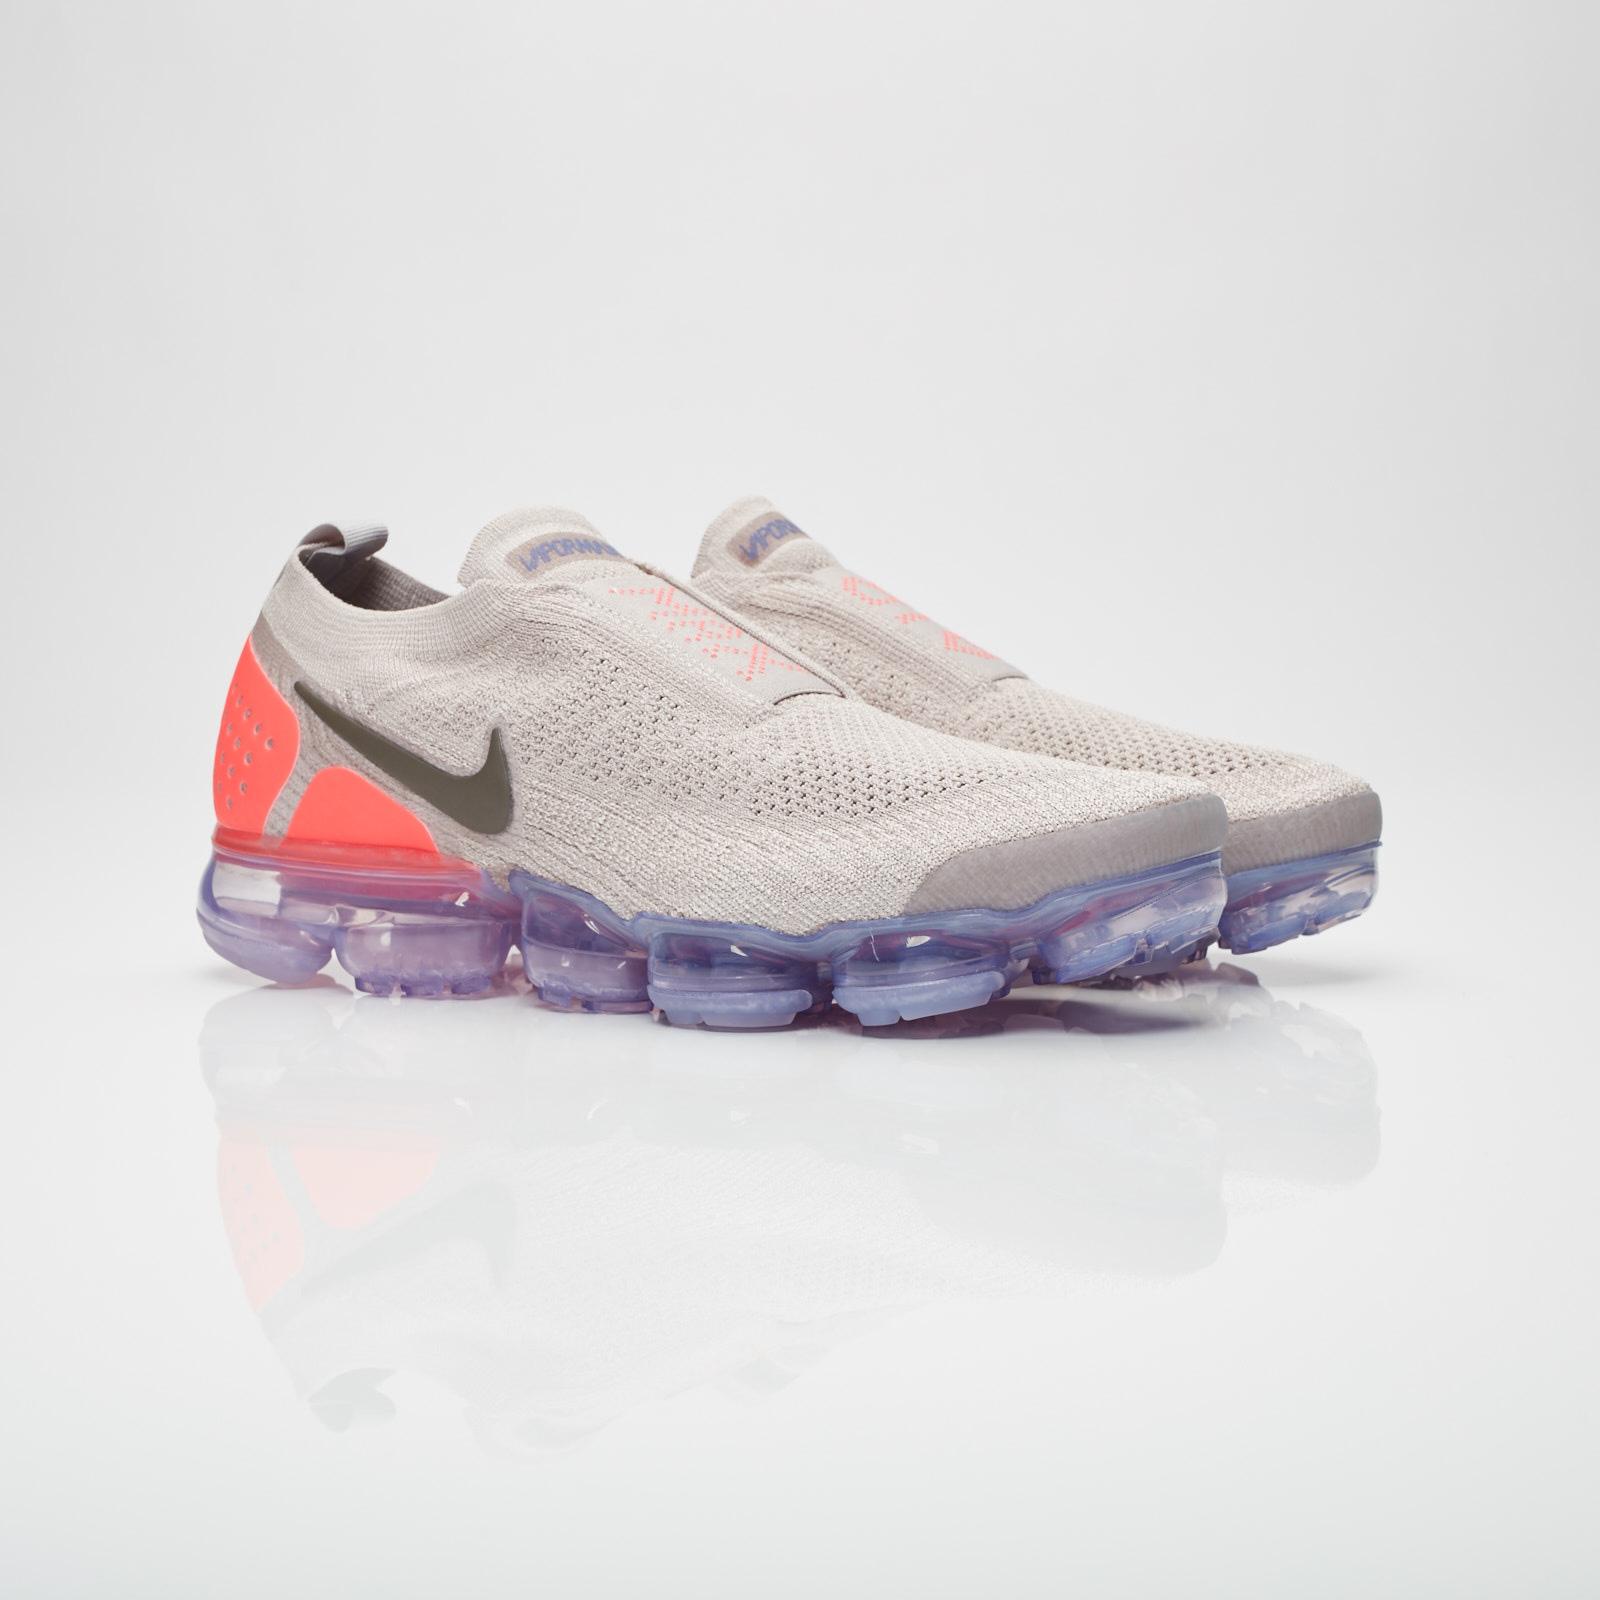 89f139c997e4f Nike Air Vapormax FK Moc 2 - Ah7006-201 - Sneakersnstuff